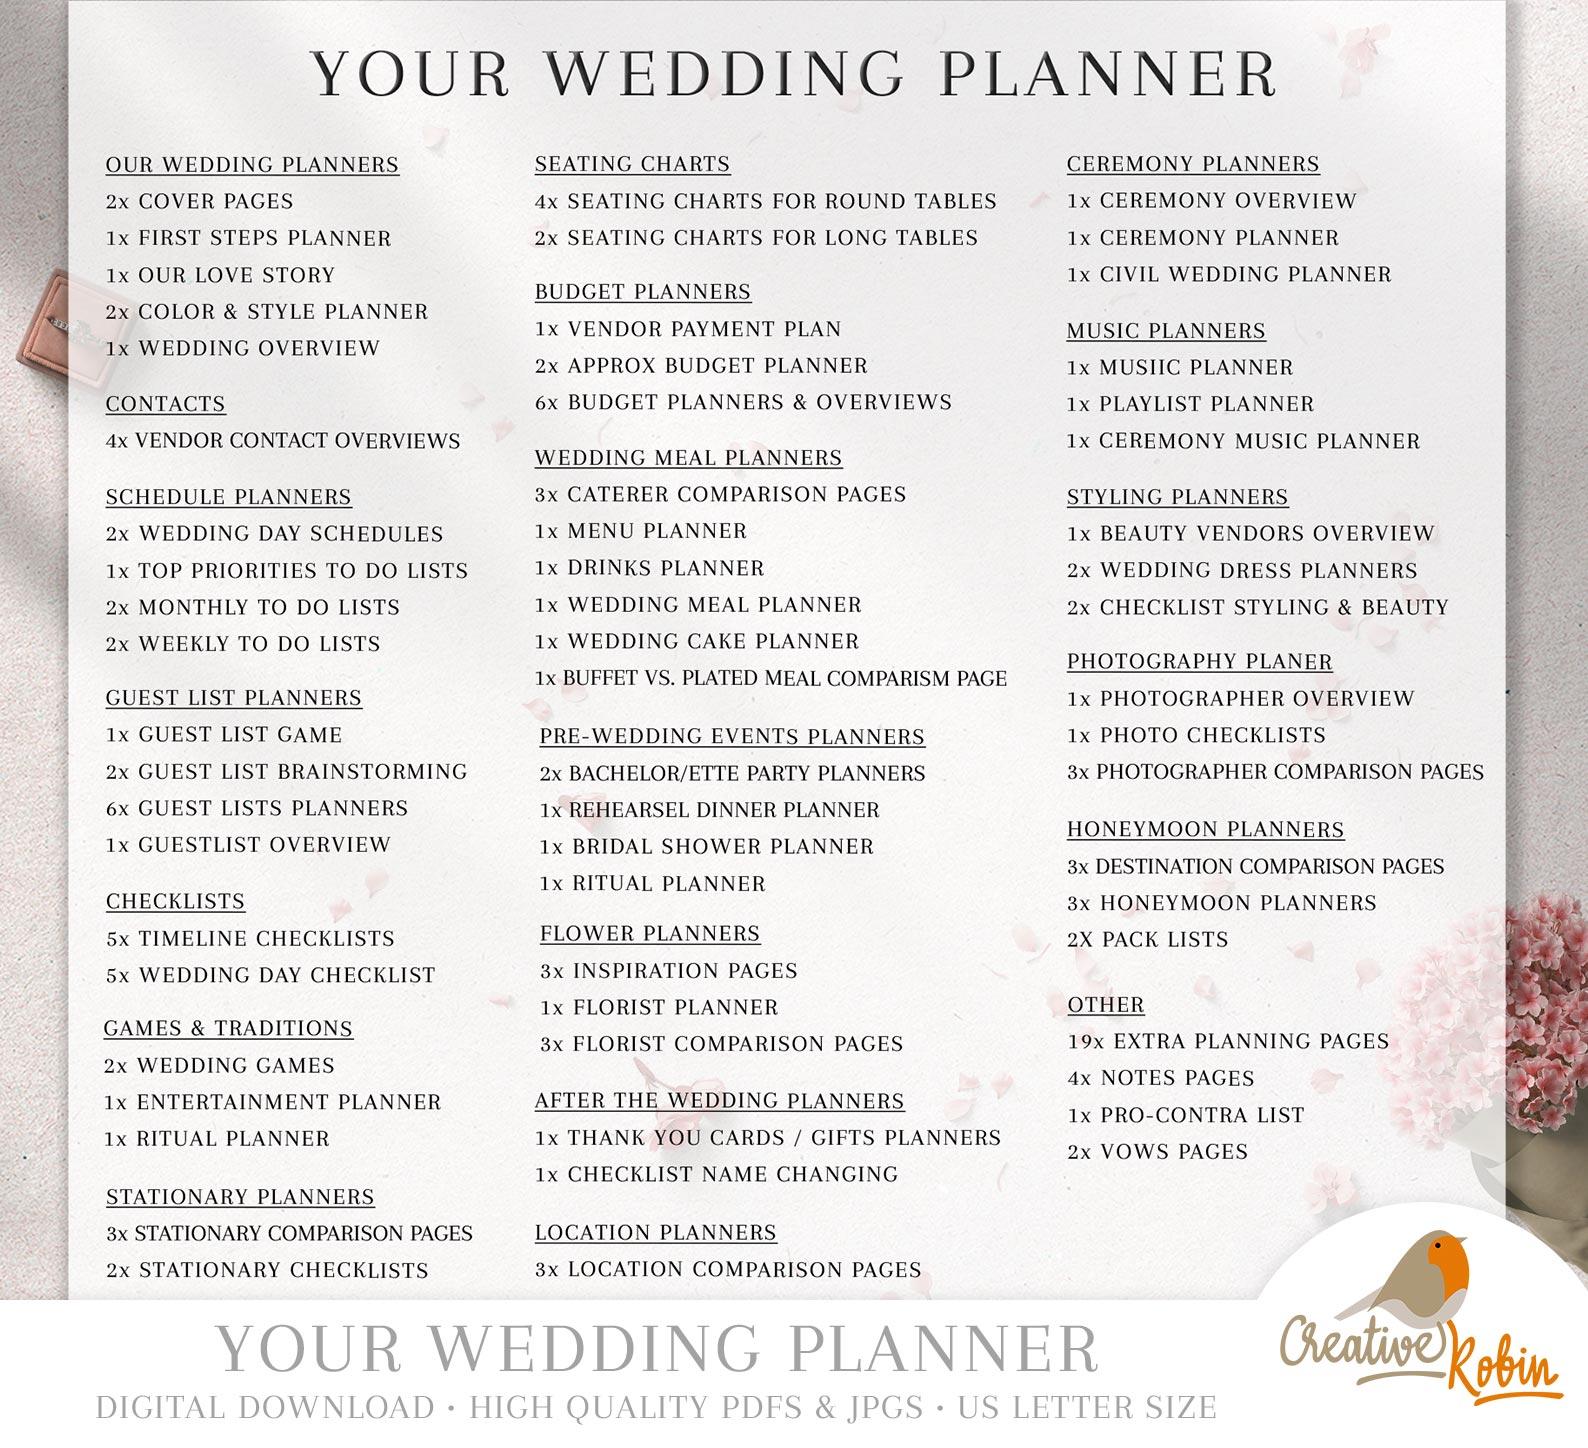 Printable Wedding Planner Wedding Organizer Bridesmaid Planner Bride Planner Wedding Checklist 135 Pages Printable Planner Creativerobin Bridestory